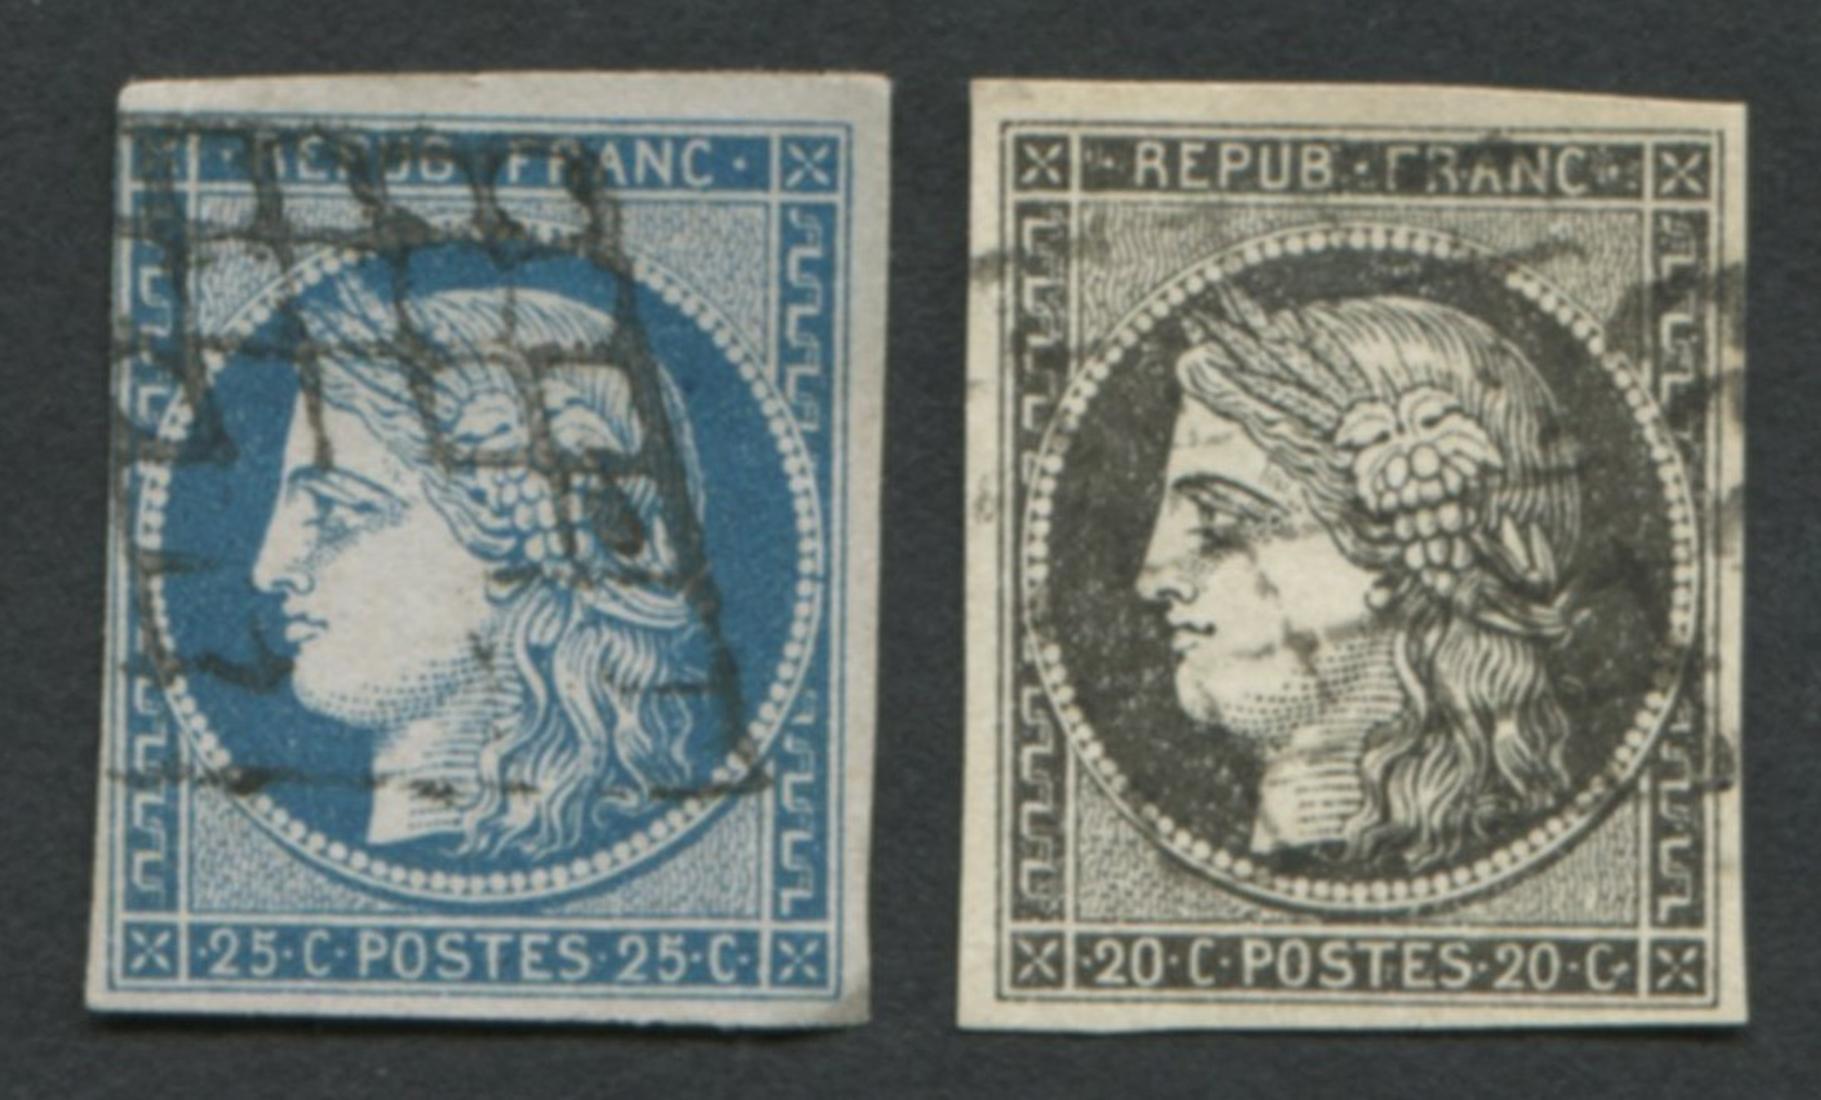 France 1849-50 #3 A1b 20c Black Buff, #6 A1 25c